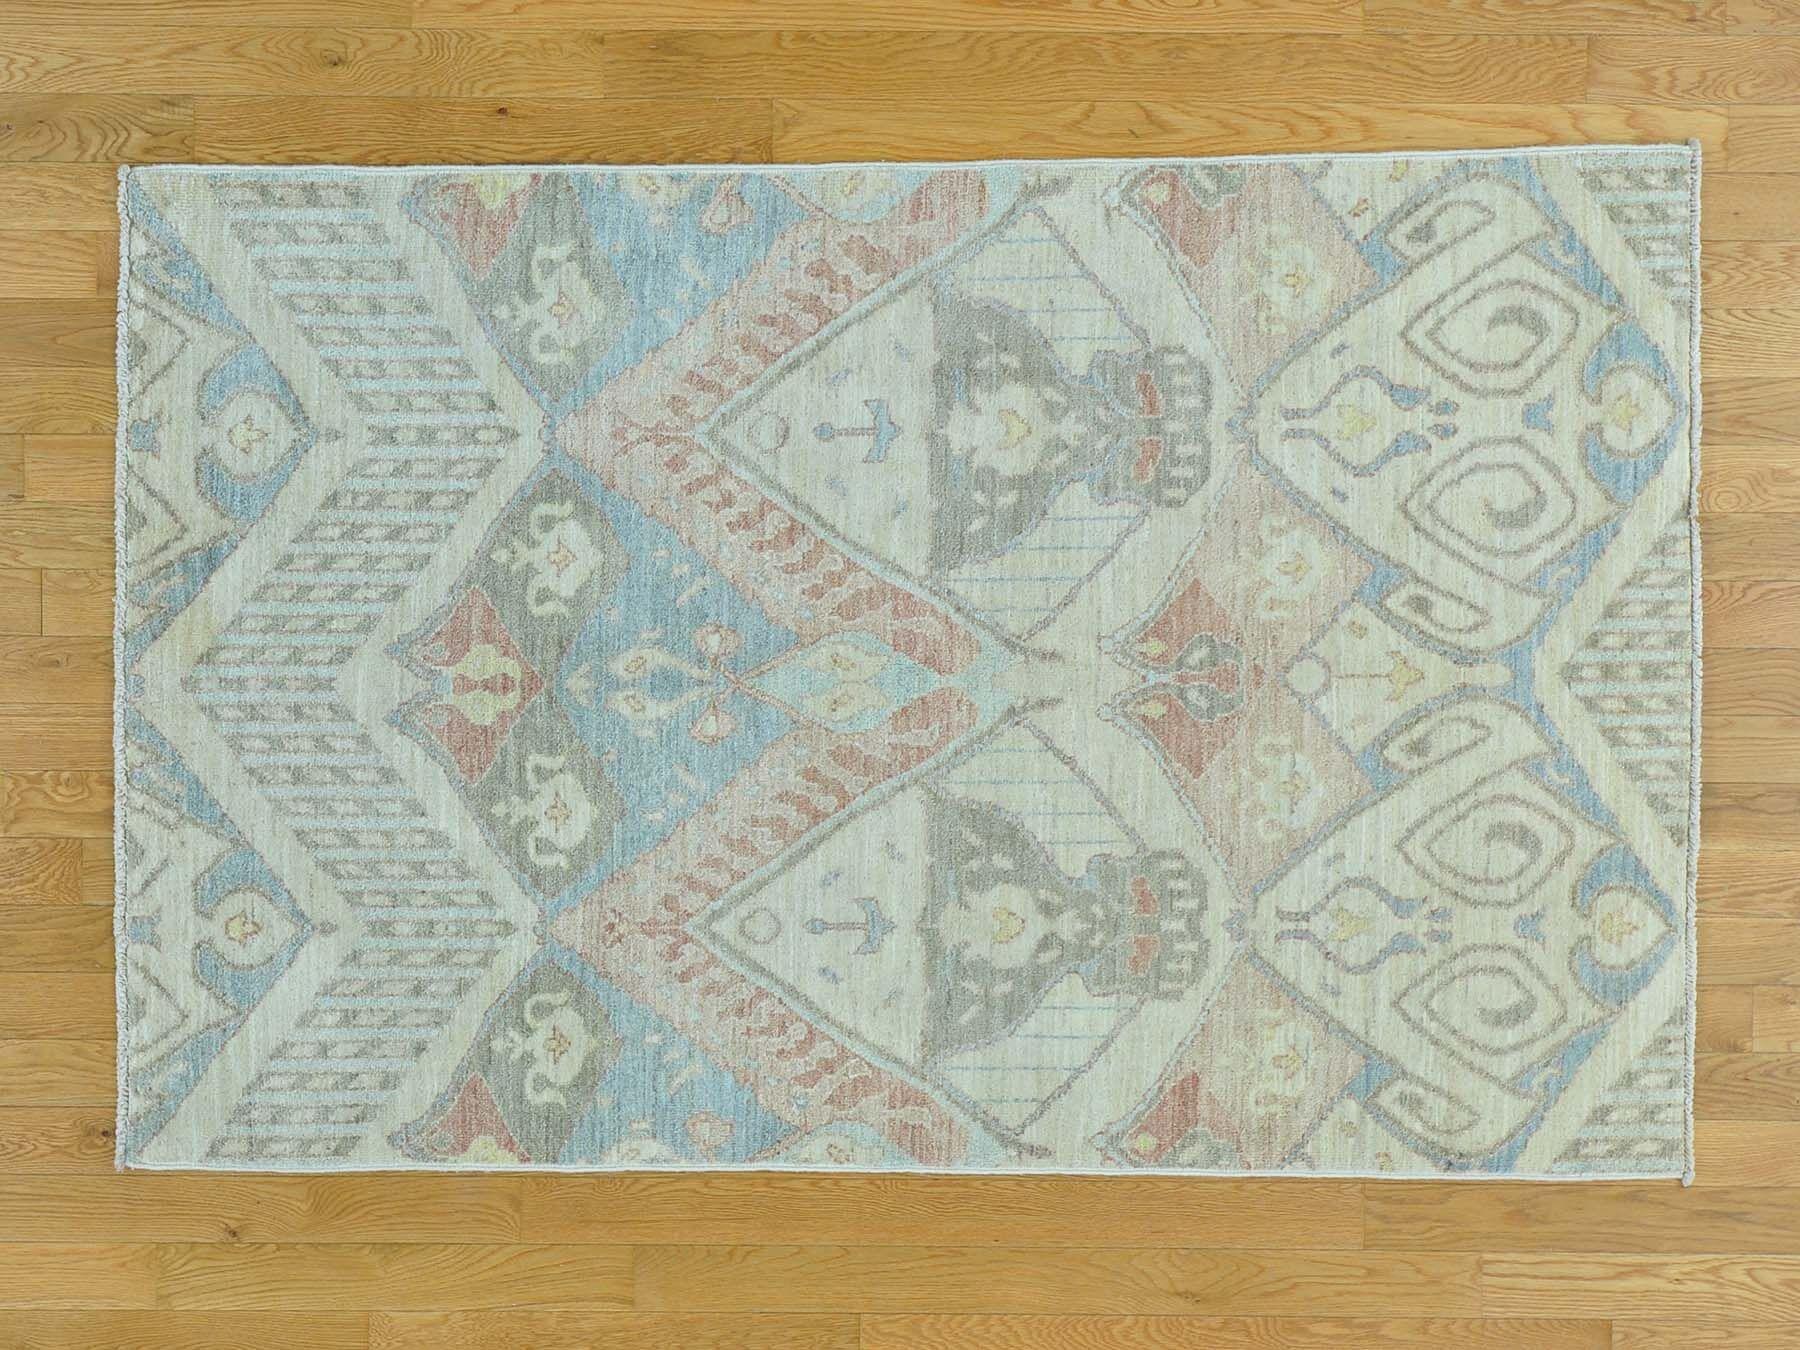 One-of-a-Kind Citrana Ikat Uzbek Design Hand-Knotted Wool Area Rug